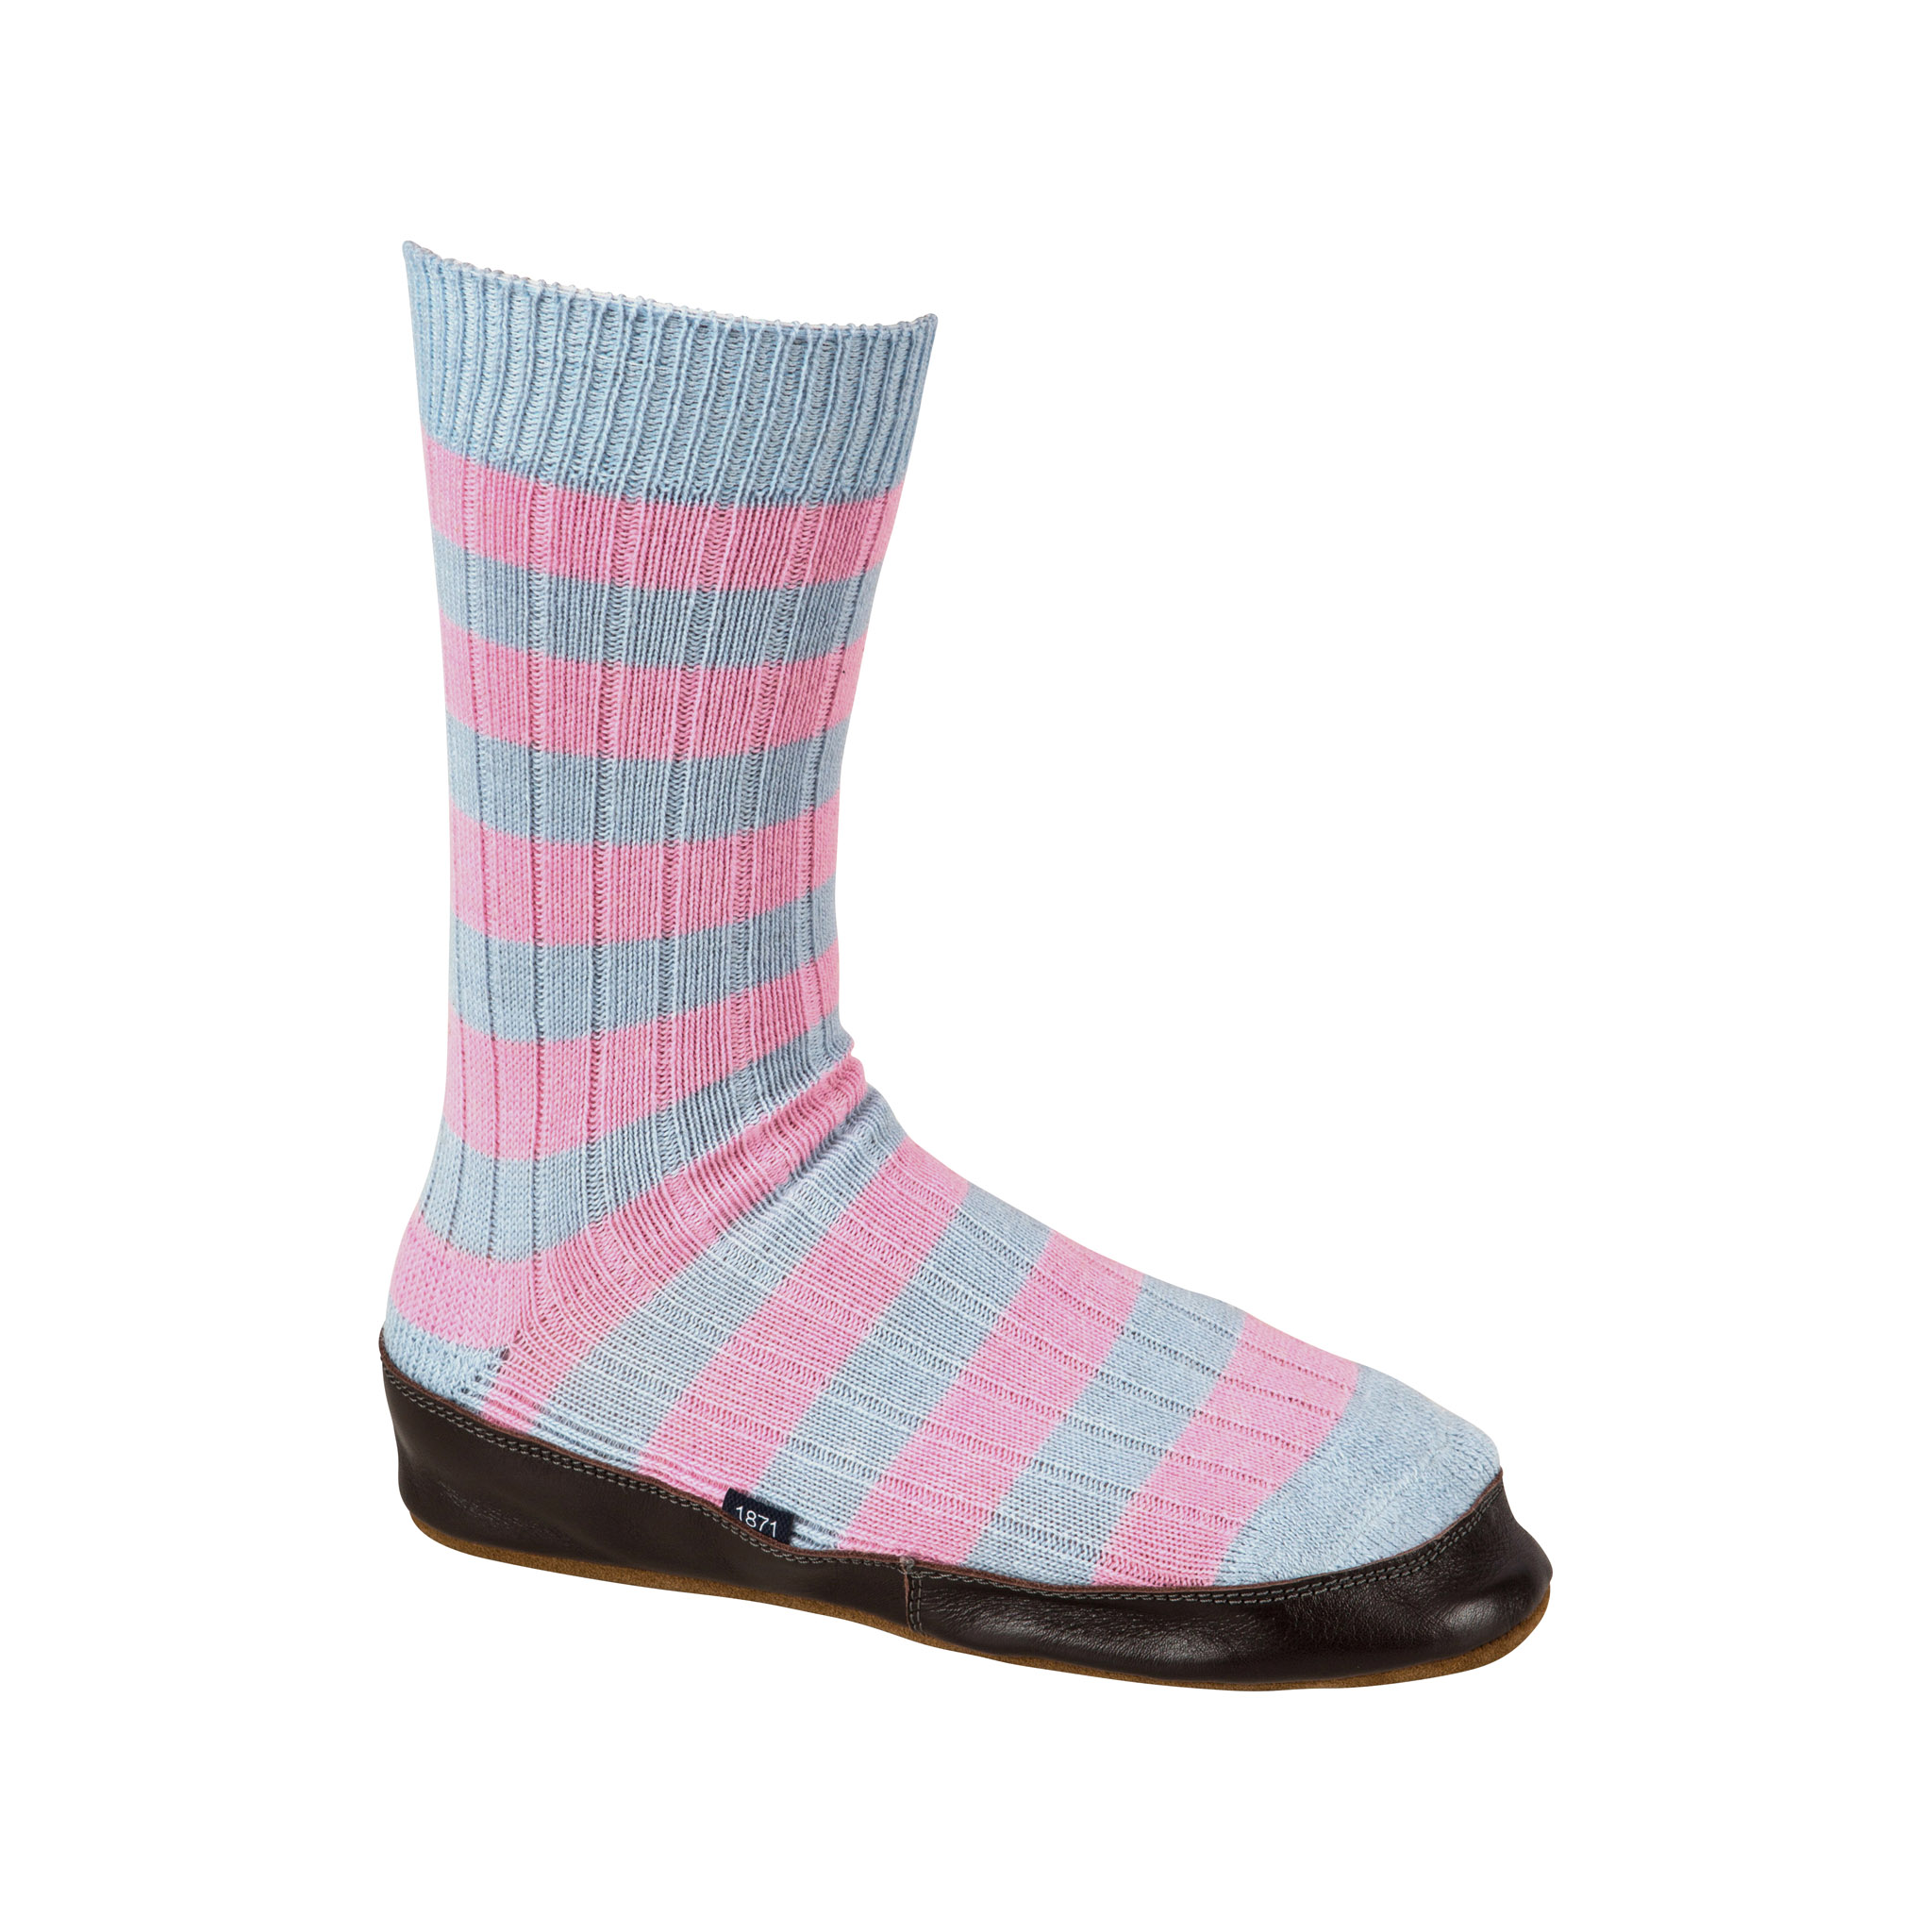 Slipper Sock sky blue and pink stripe